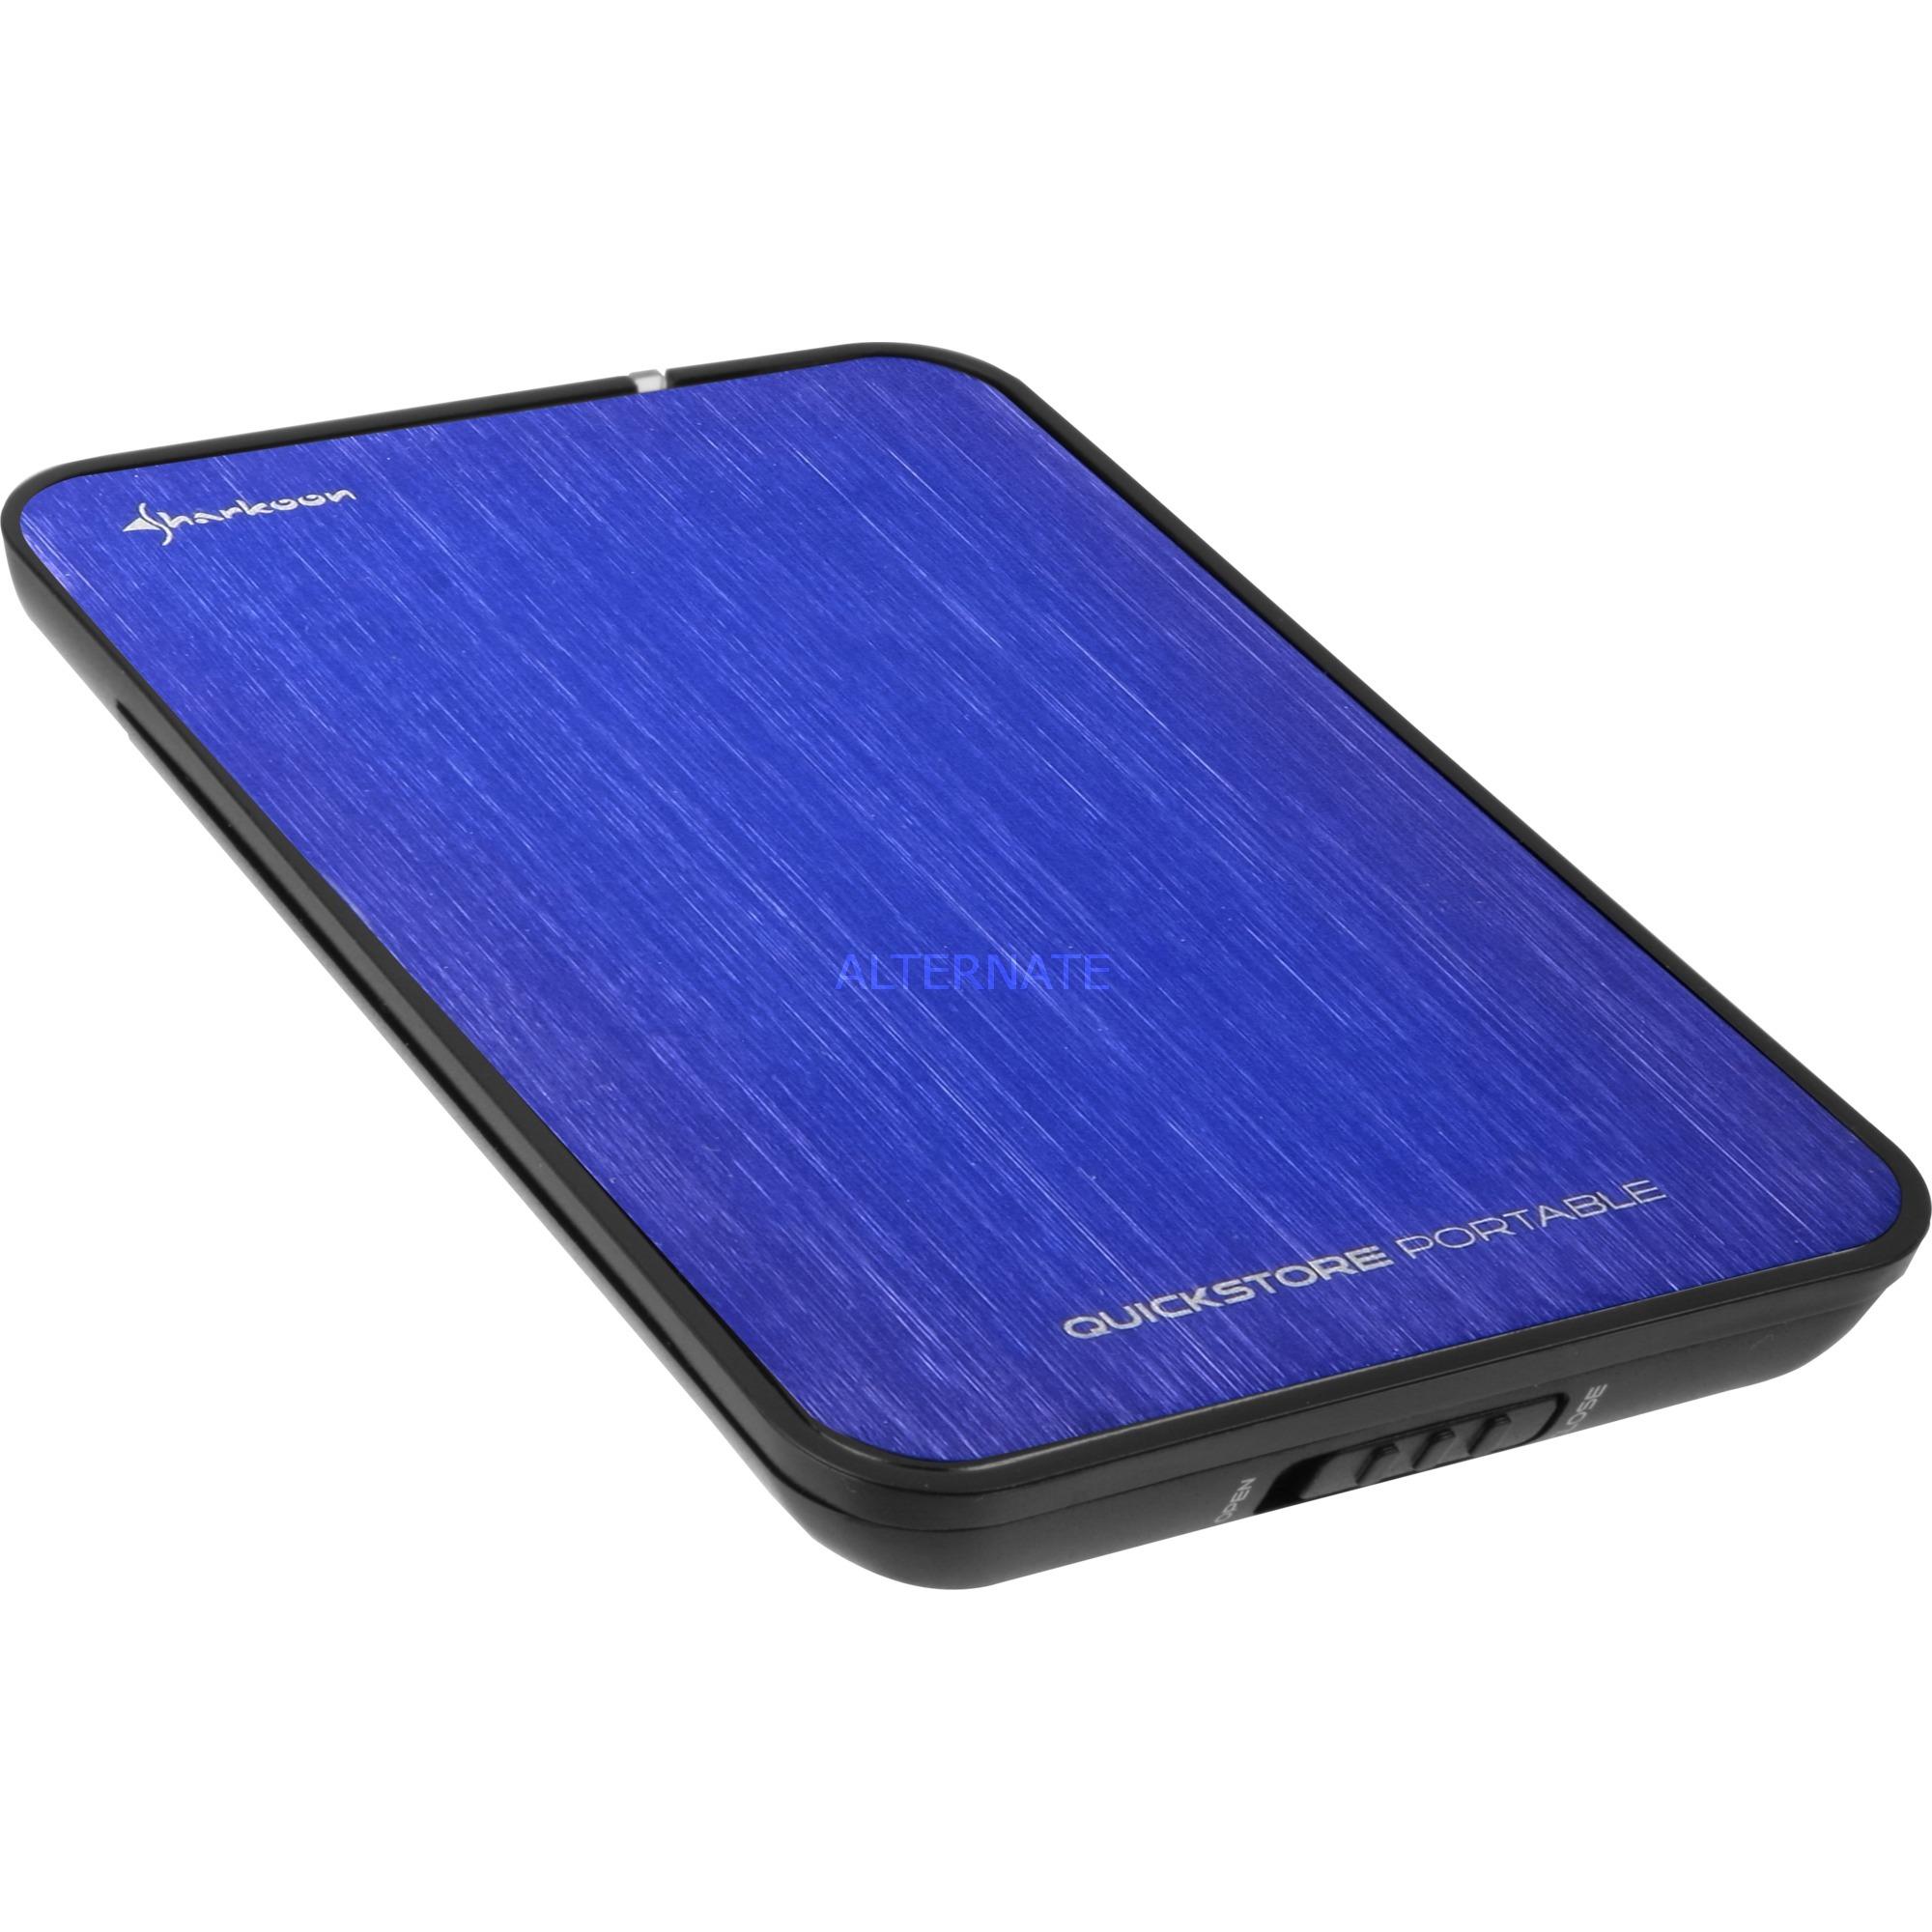 quickstore-portable-25-sort-blaa-drev-kabinet